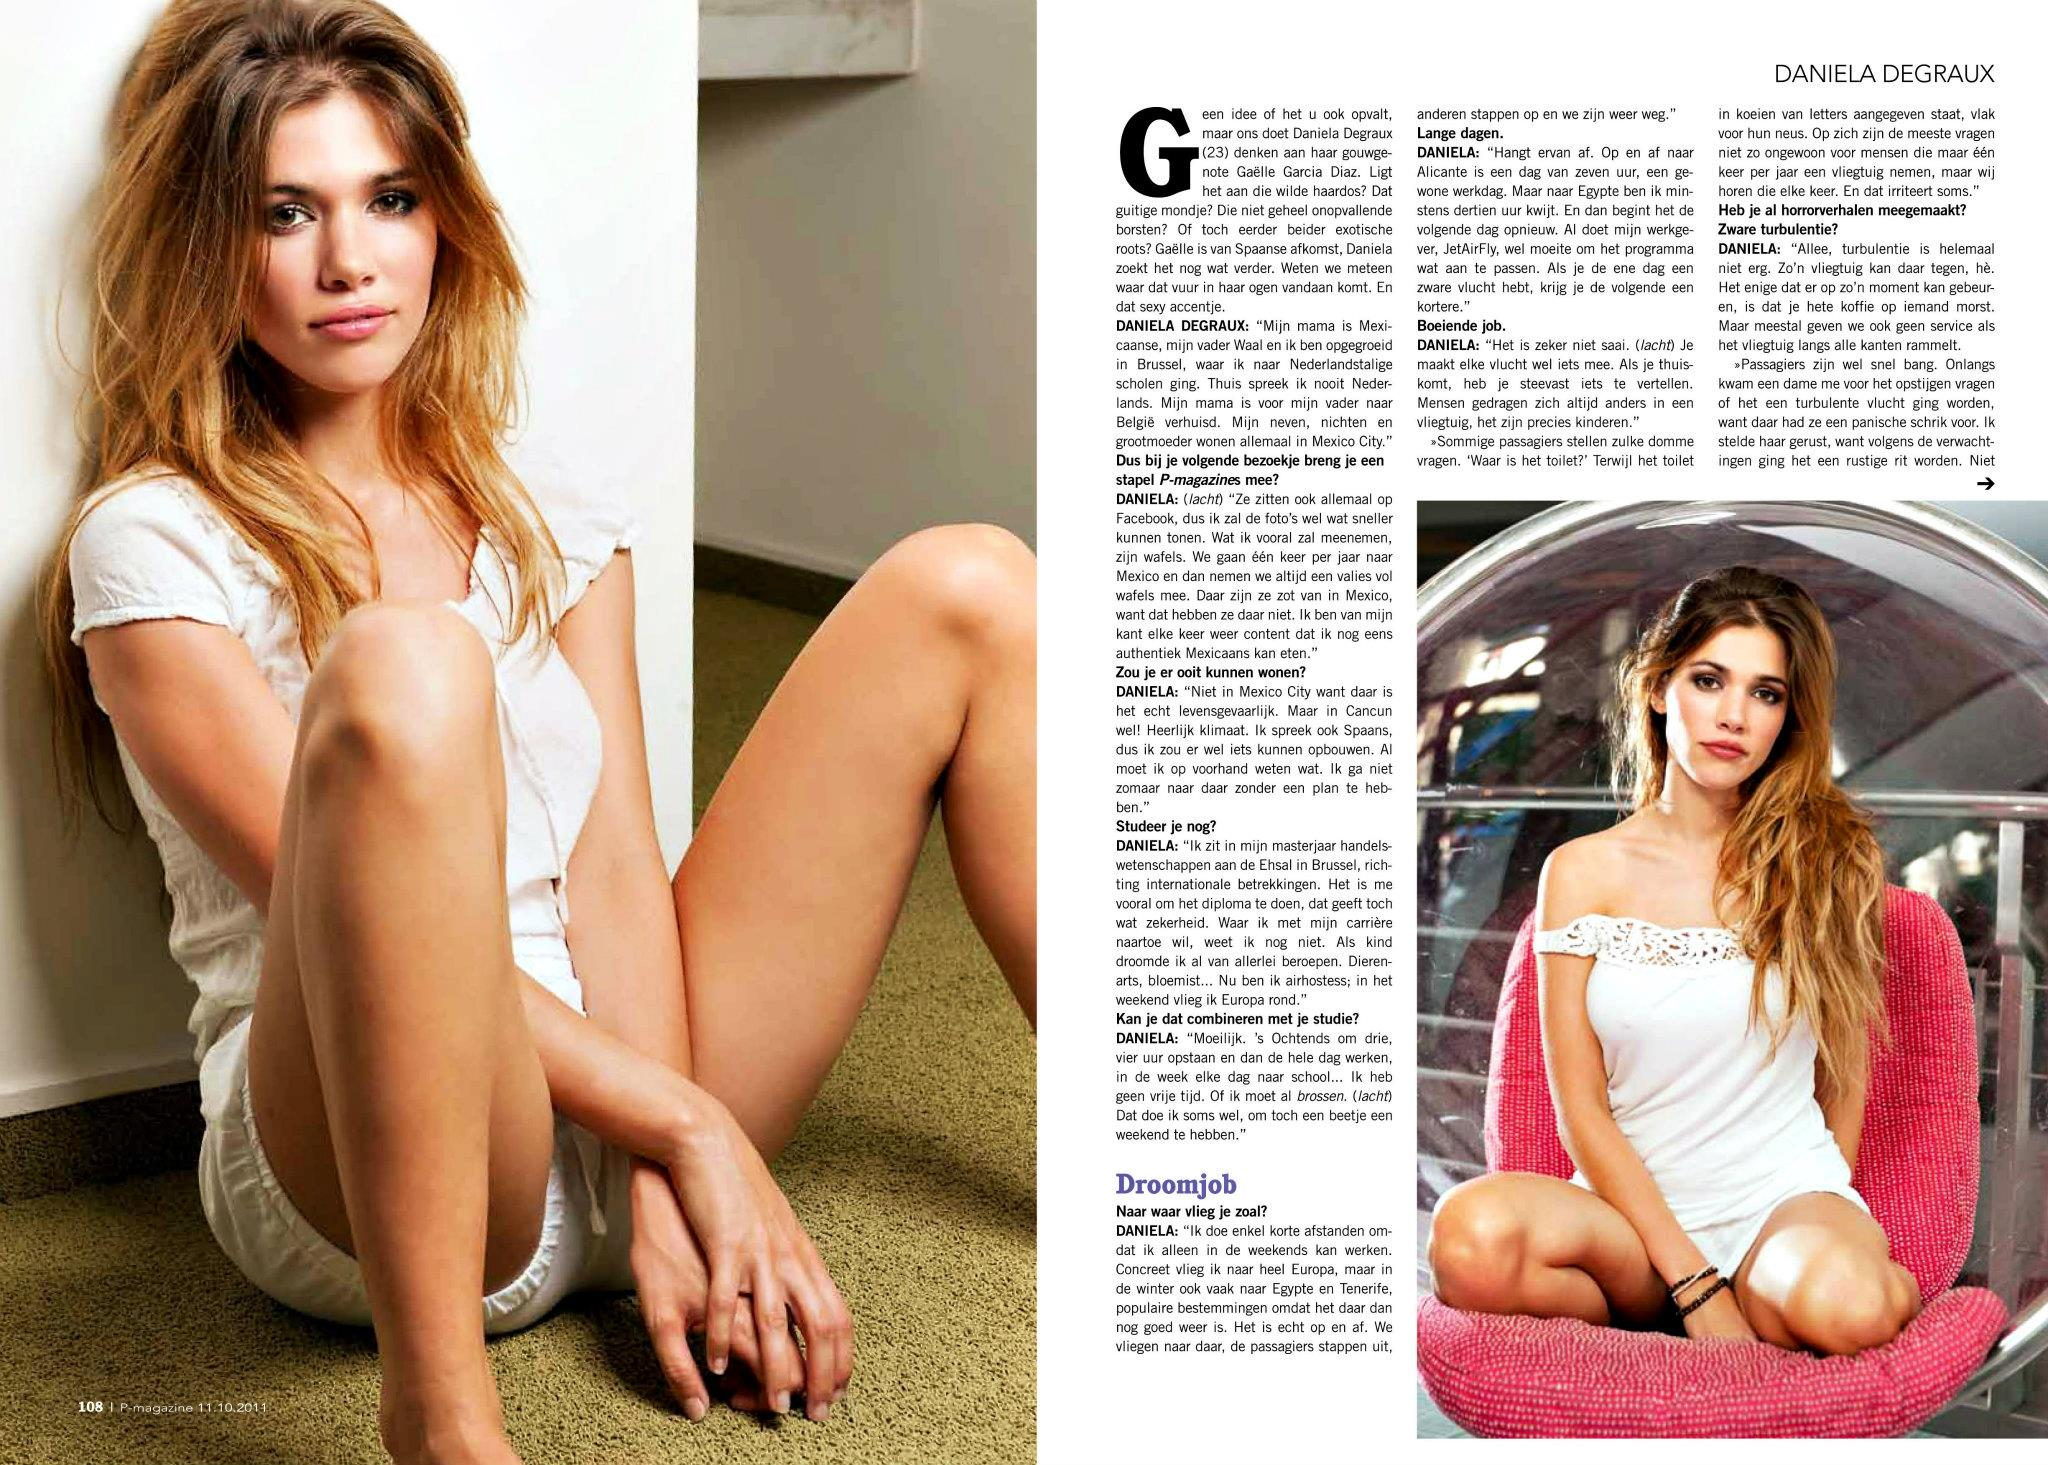 bart albrecht fotograaf photographer belgium p magazine che playboy editorial magazines glamour boudoir daniela degraux kelly buytaert 0003.jpg